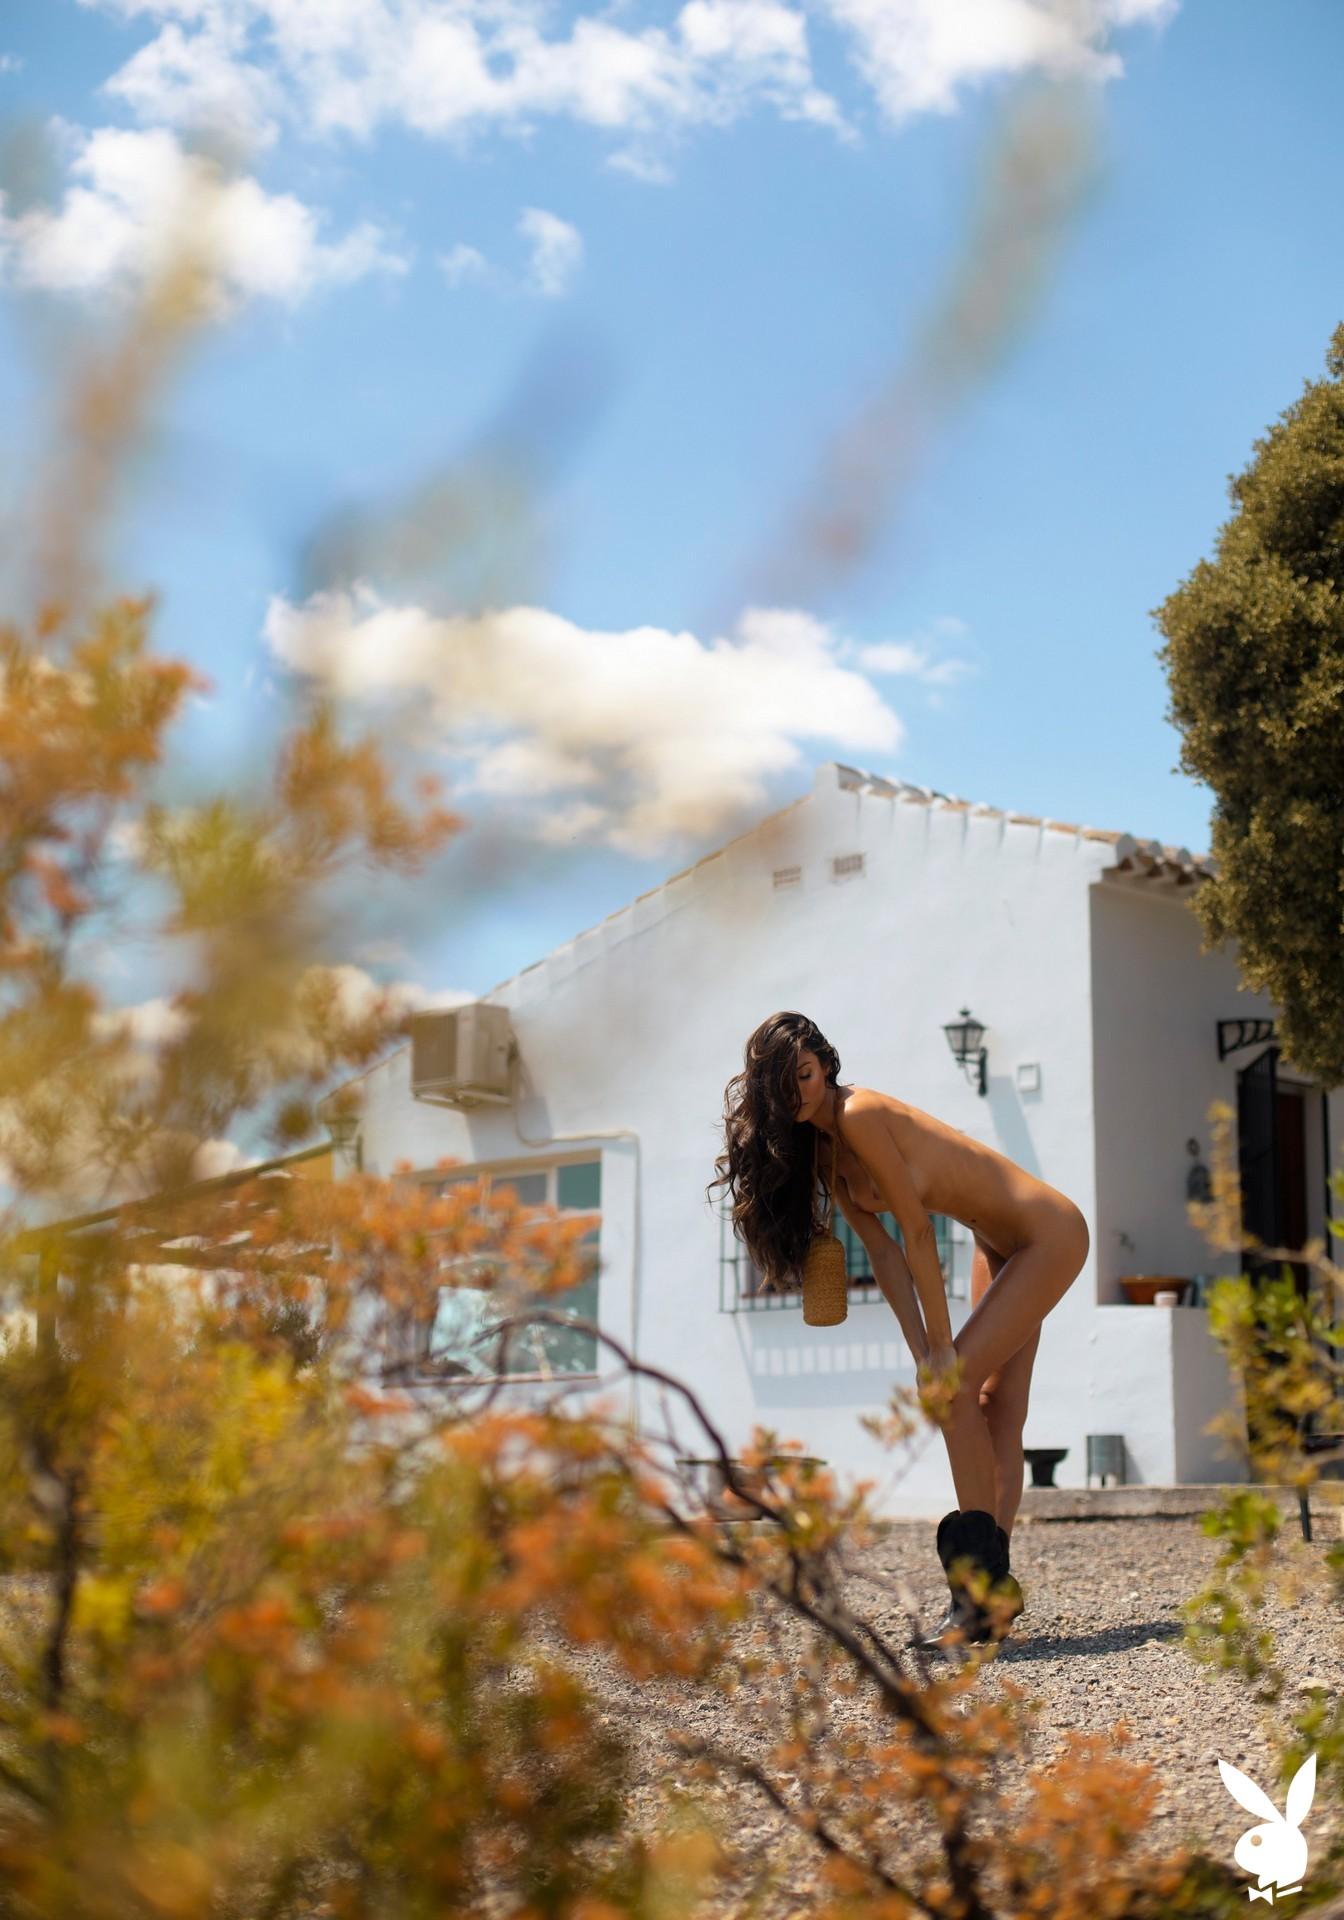 Zurine Aspiunza In Playboy International Playboy Plus (19)